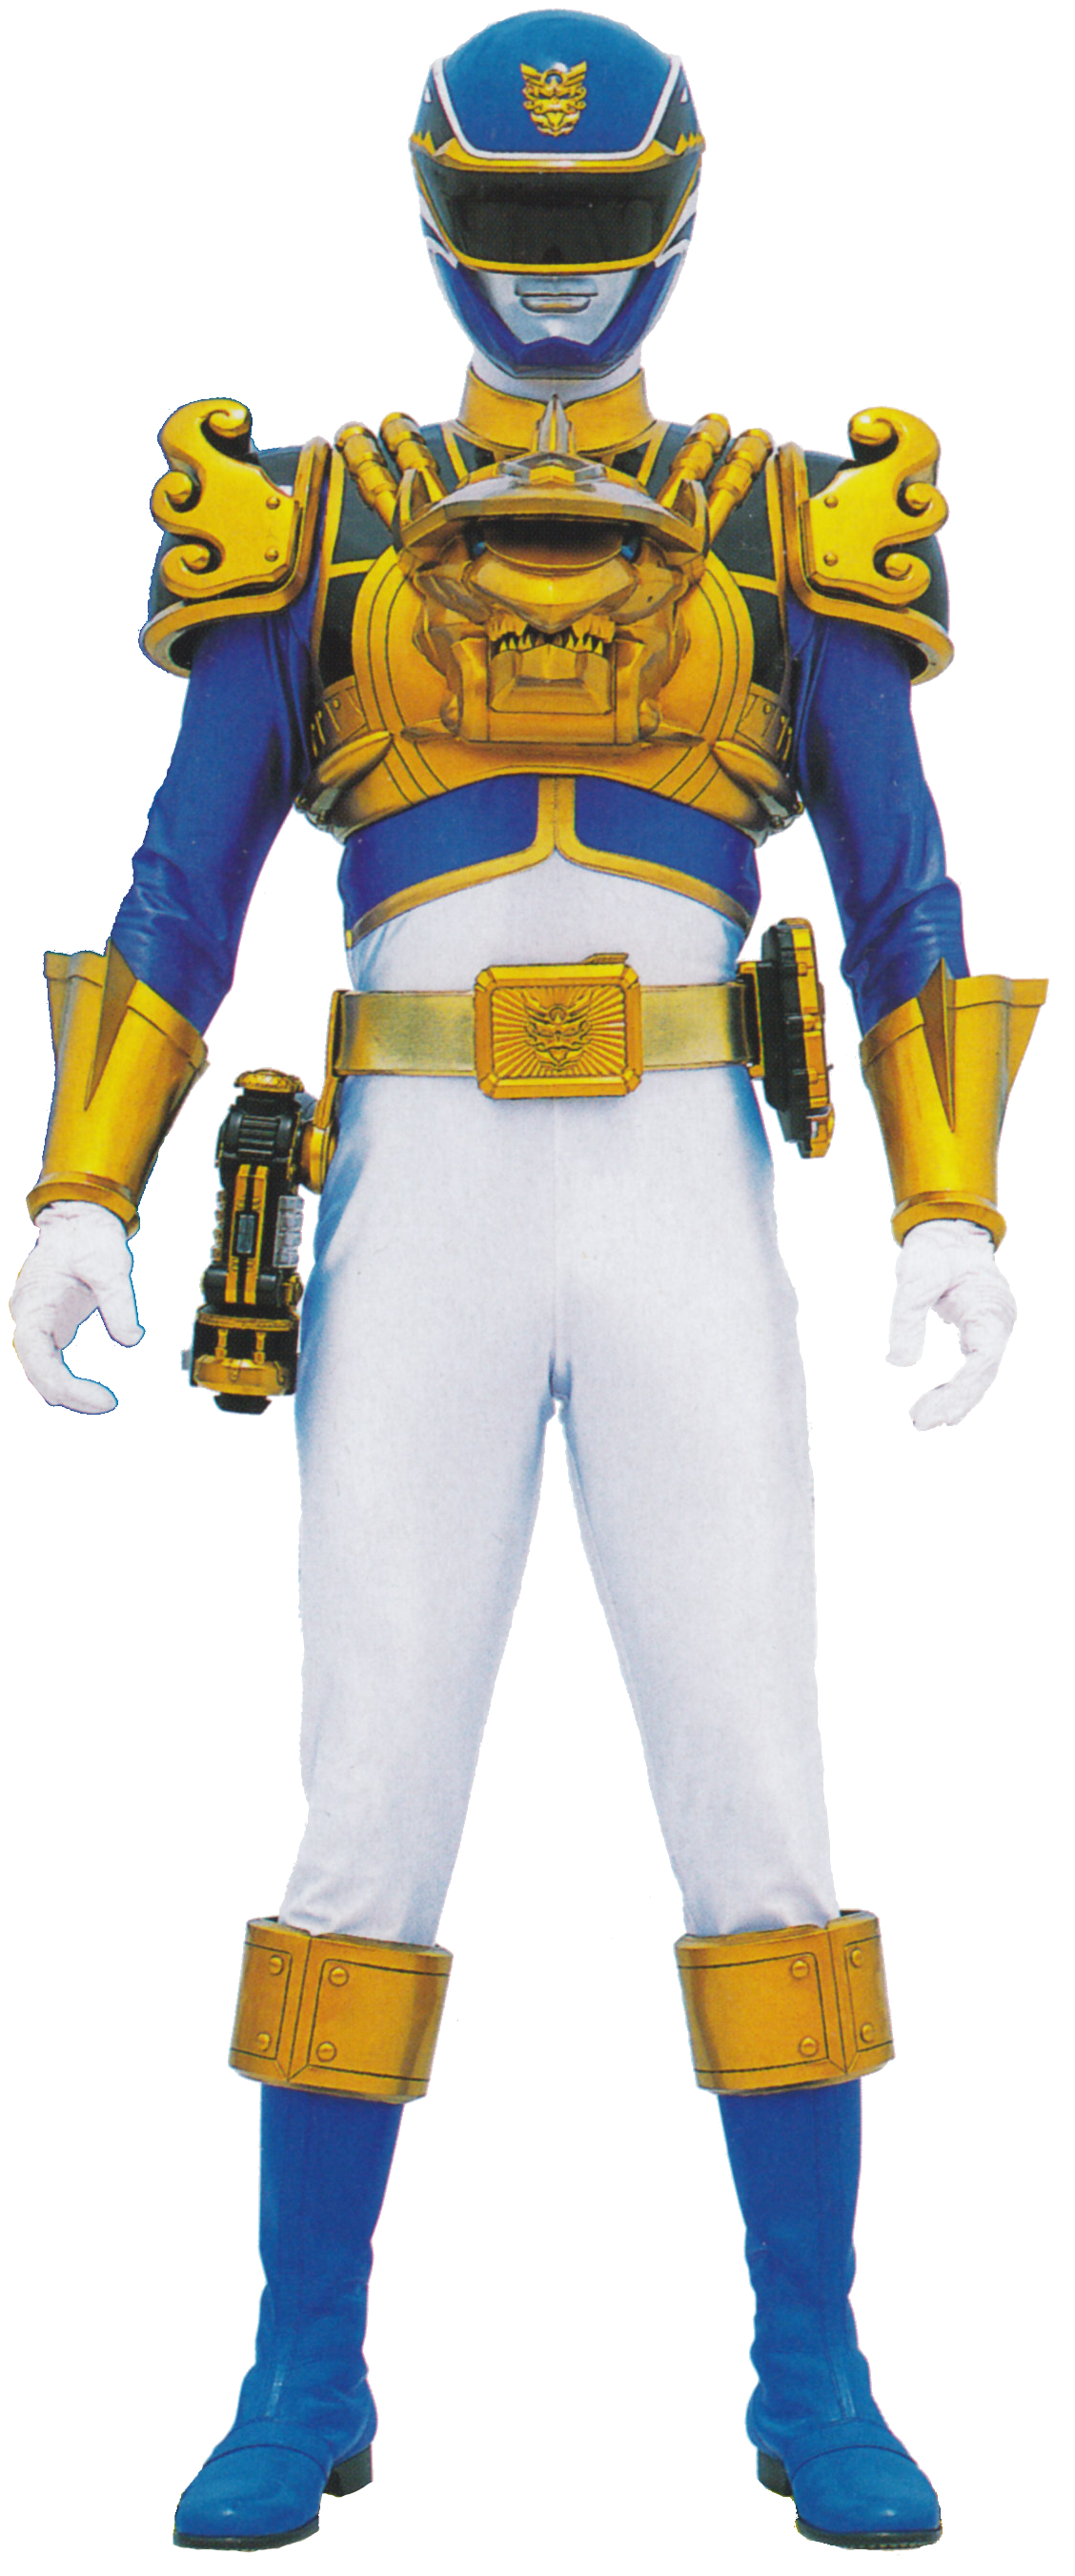 Image - Ultra Blue Ranger (Power Rangers Megaforce).png ...